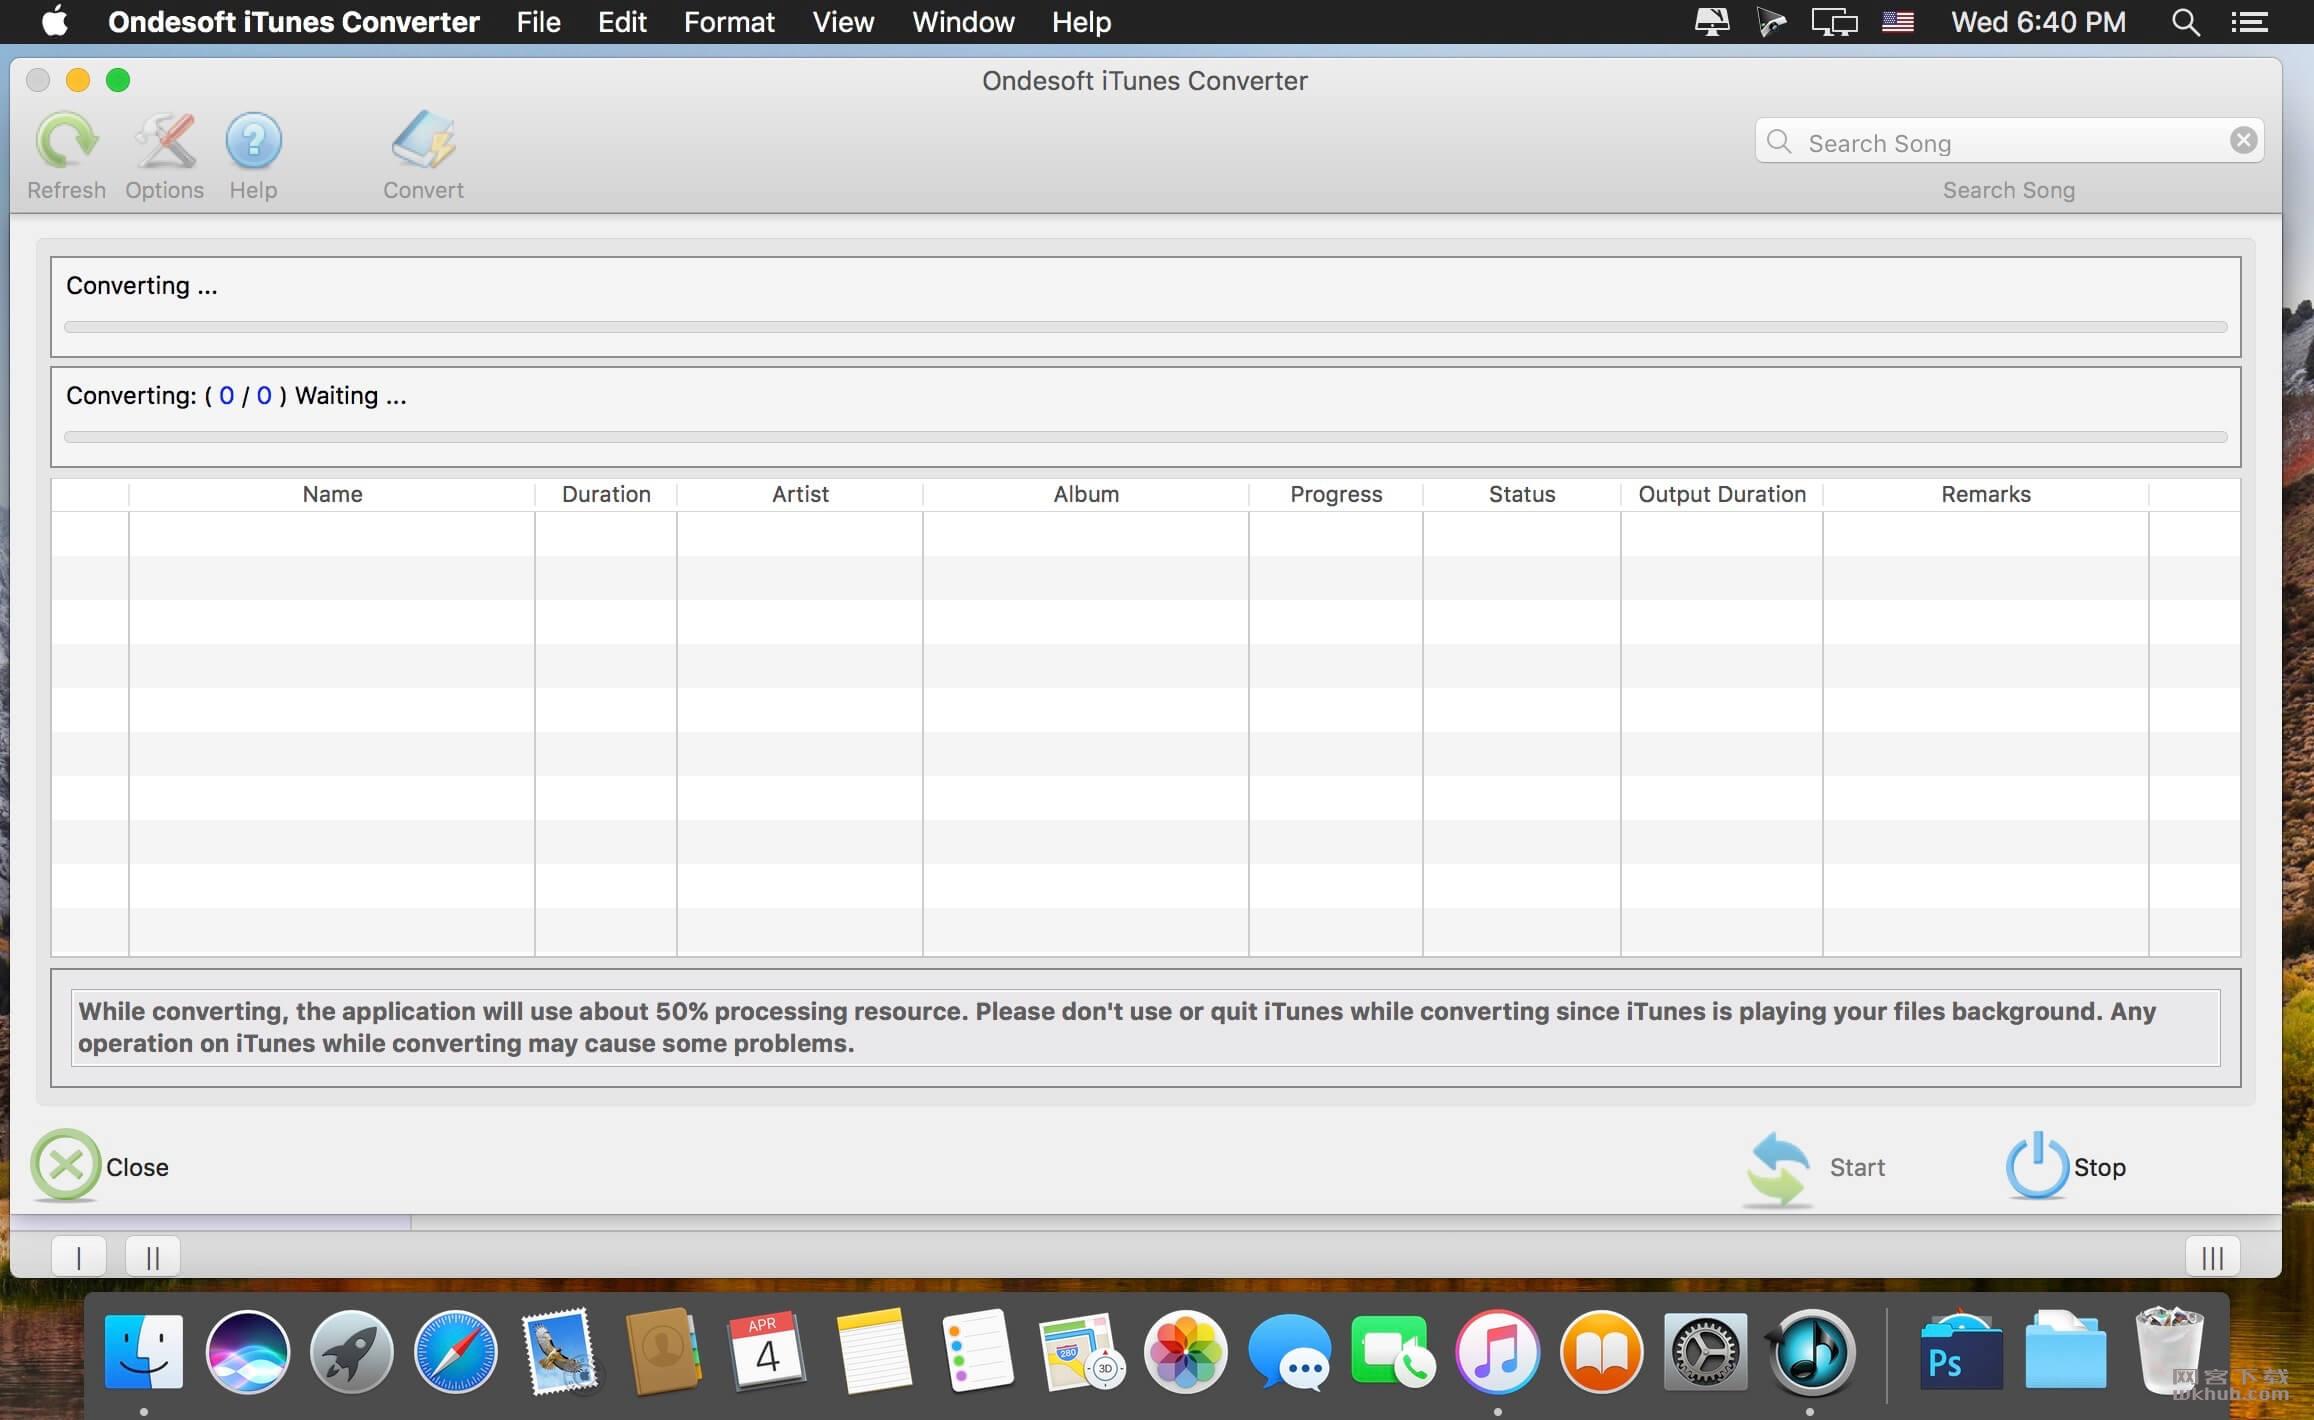 Ondesoft iTunes Converter 3.0.1 音频DRM保护移除工具